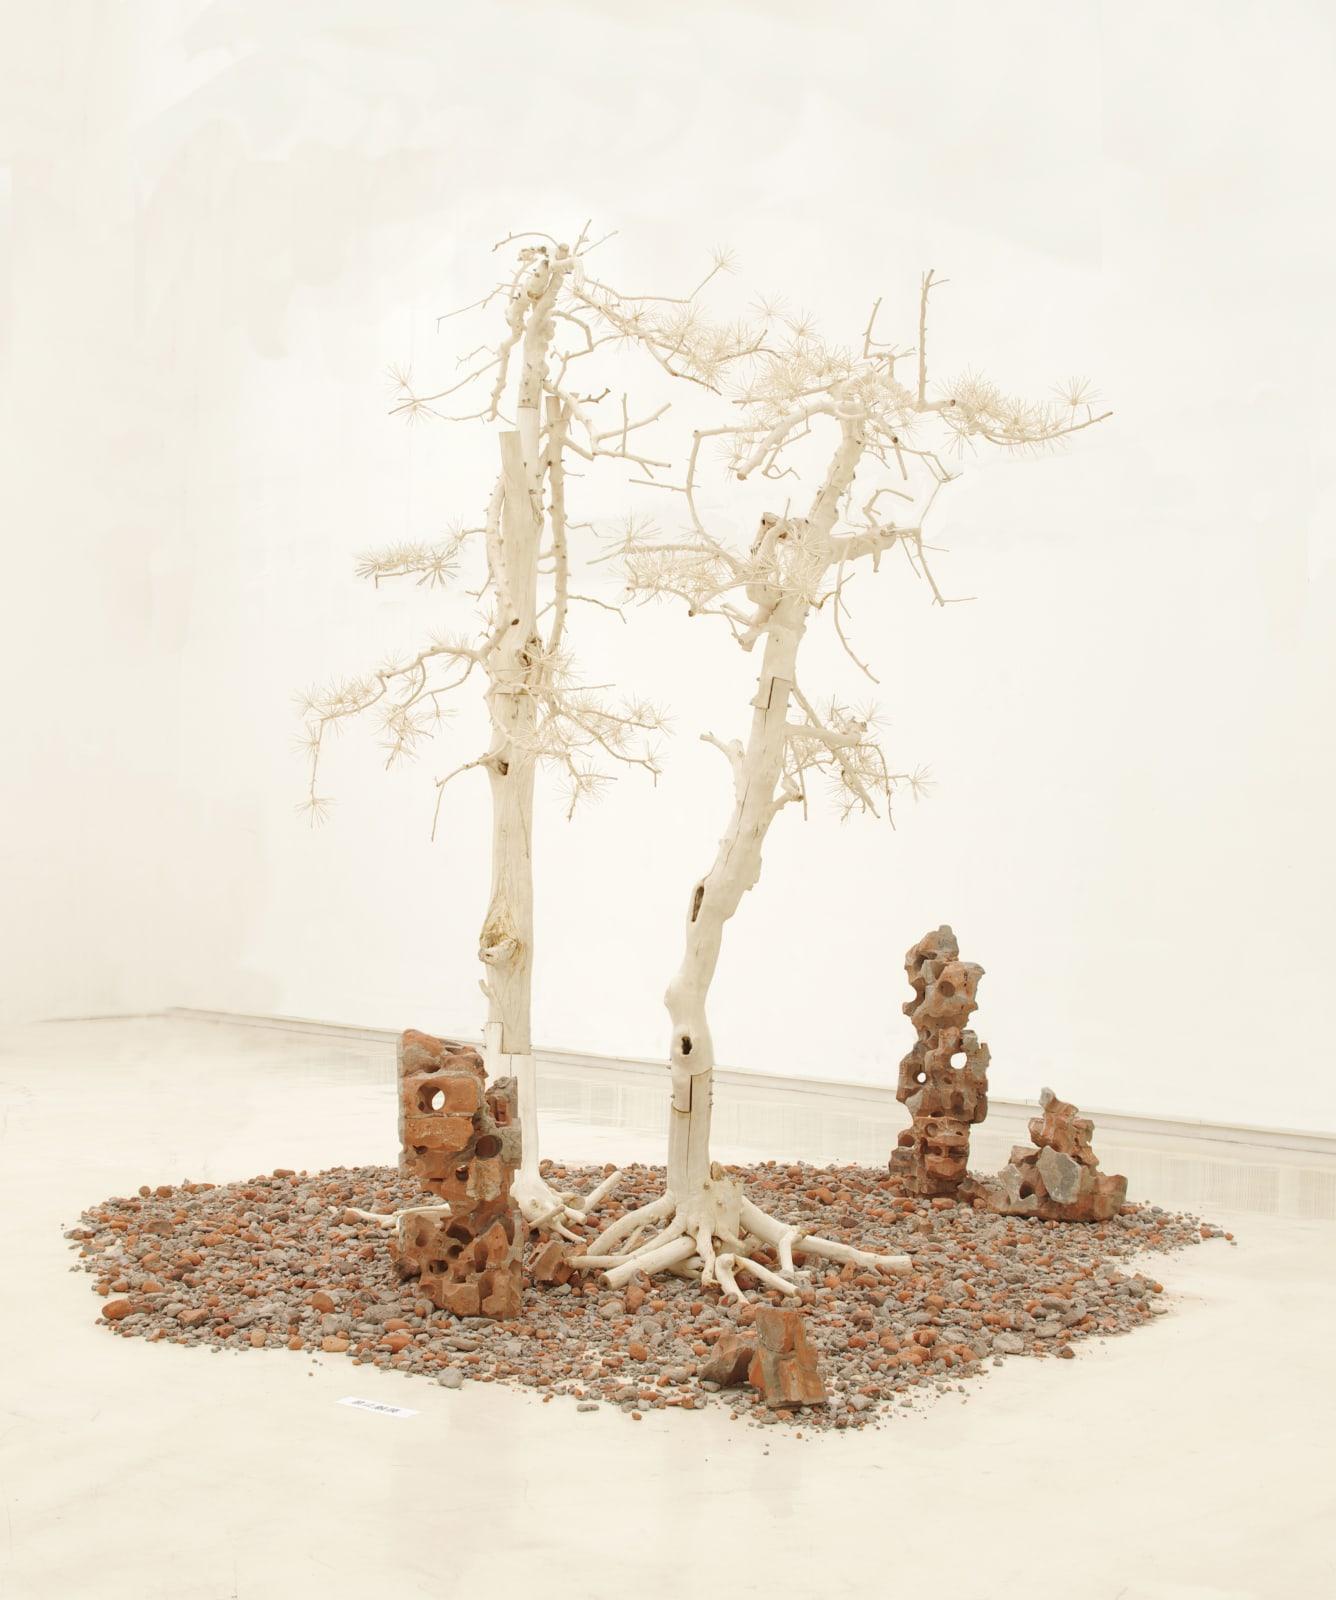 Shi Jinsong 史金淞, Pine Tree Garden 雙松園, 2012